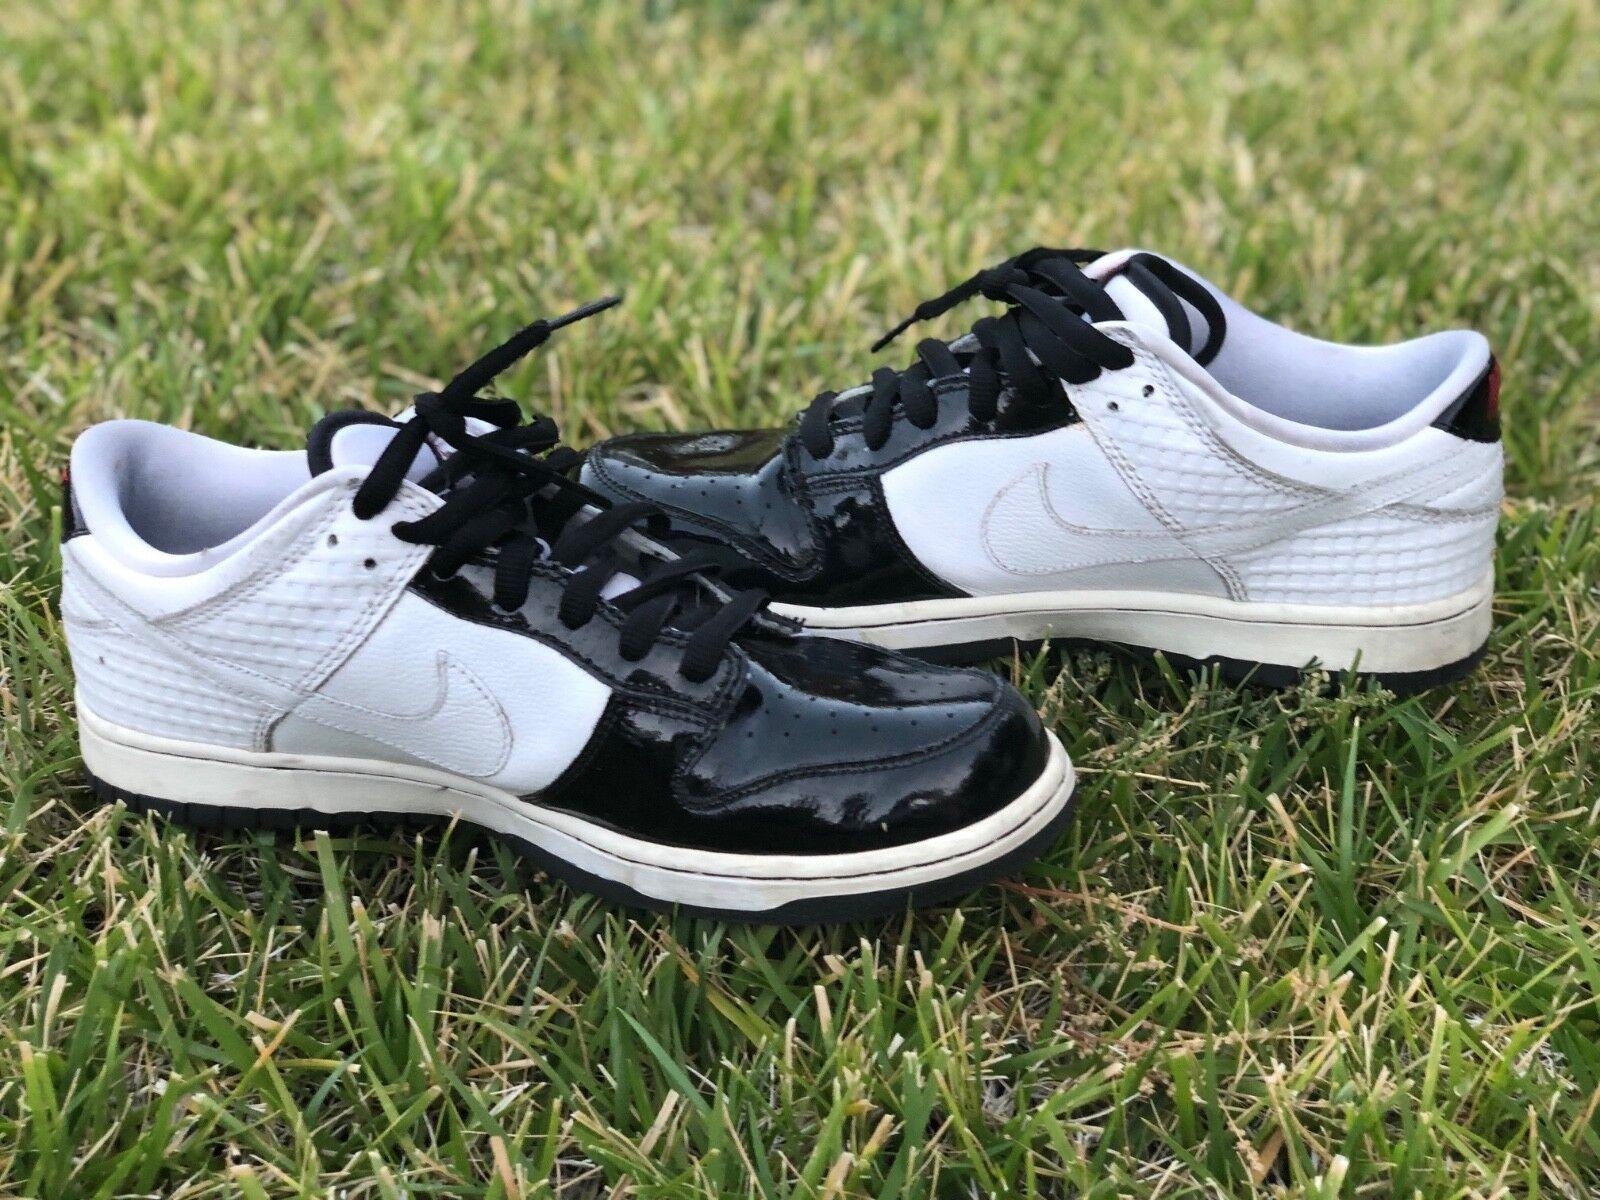 7142c88387e63 Nike Roshe Run Qs Marble Pack Cool Grey 9.5